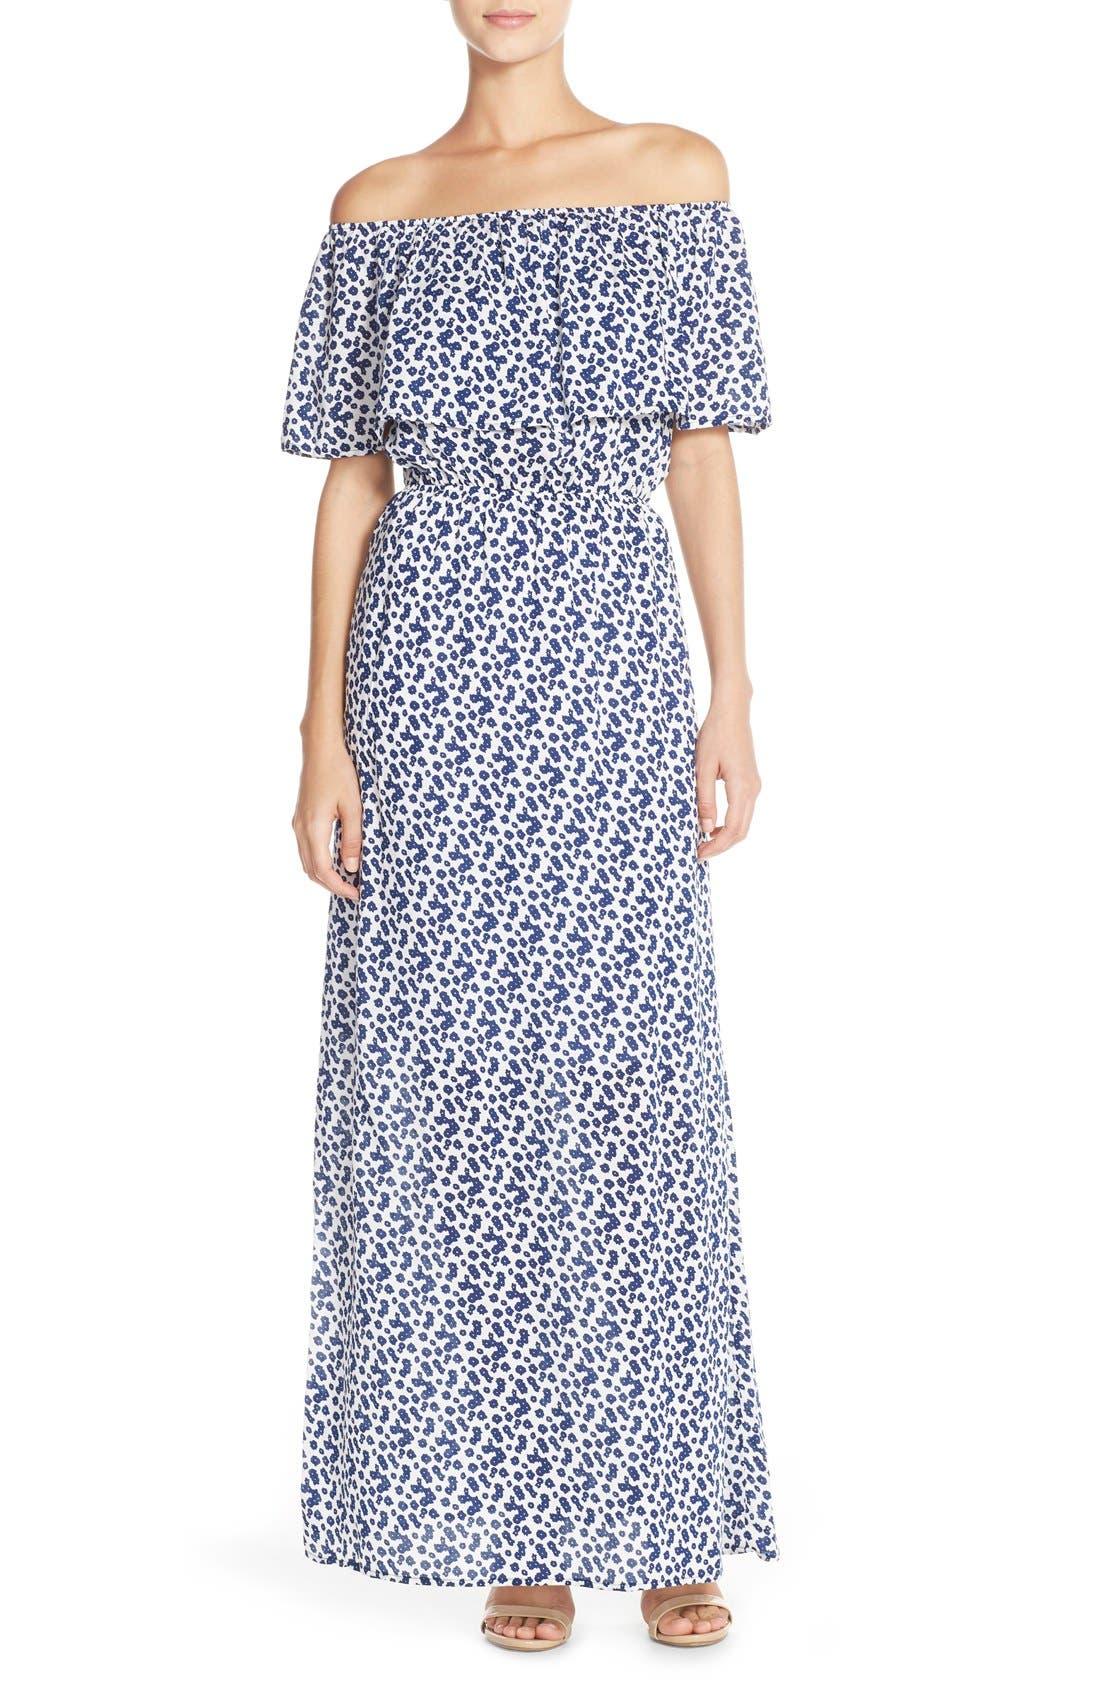 Tie Dye Off Shoulder Maxi Dress,                         Main,                         color, Navy Daisy Print